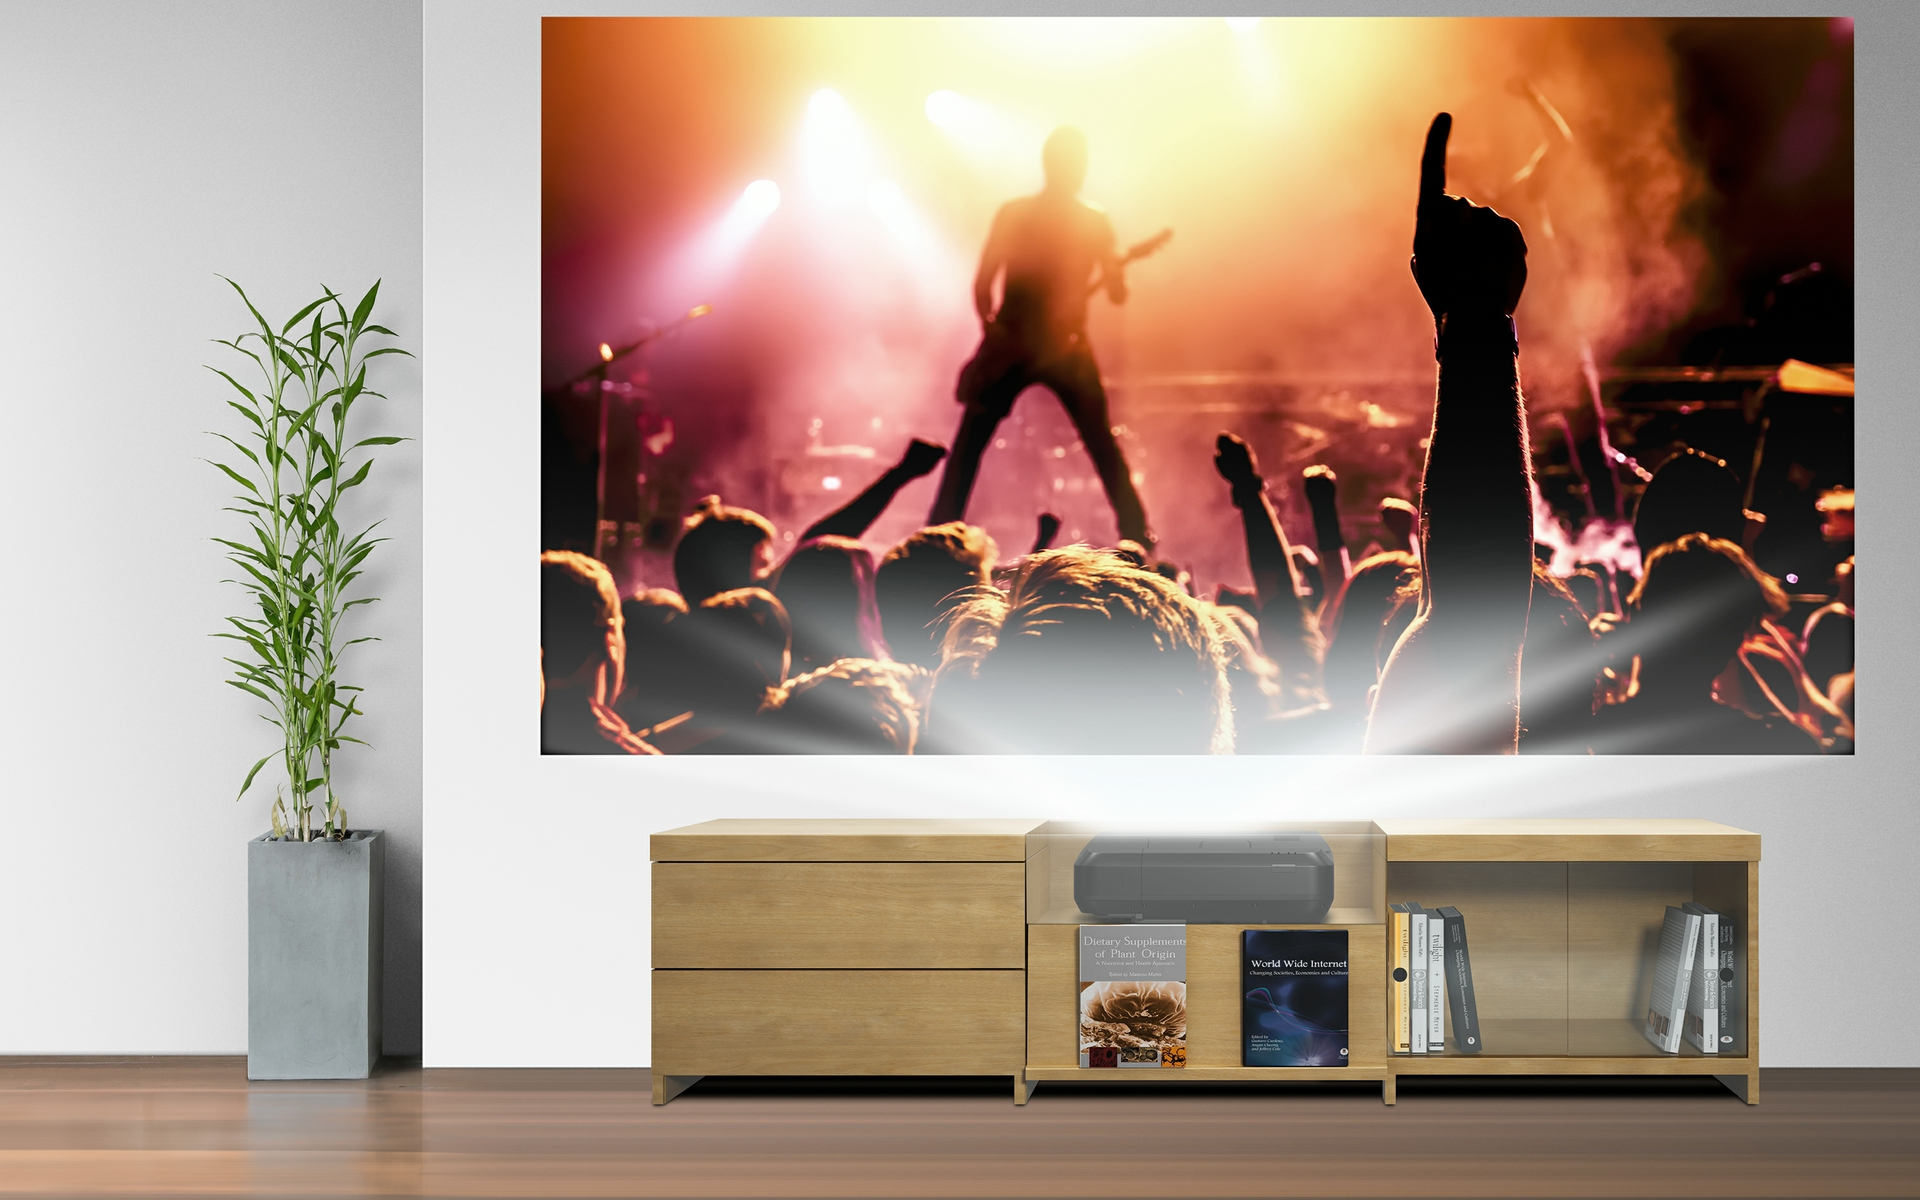 Epson Home Cinema LS100 Digital Laser Display